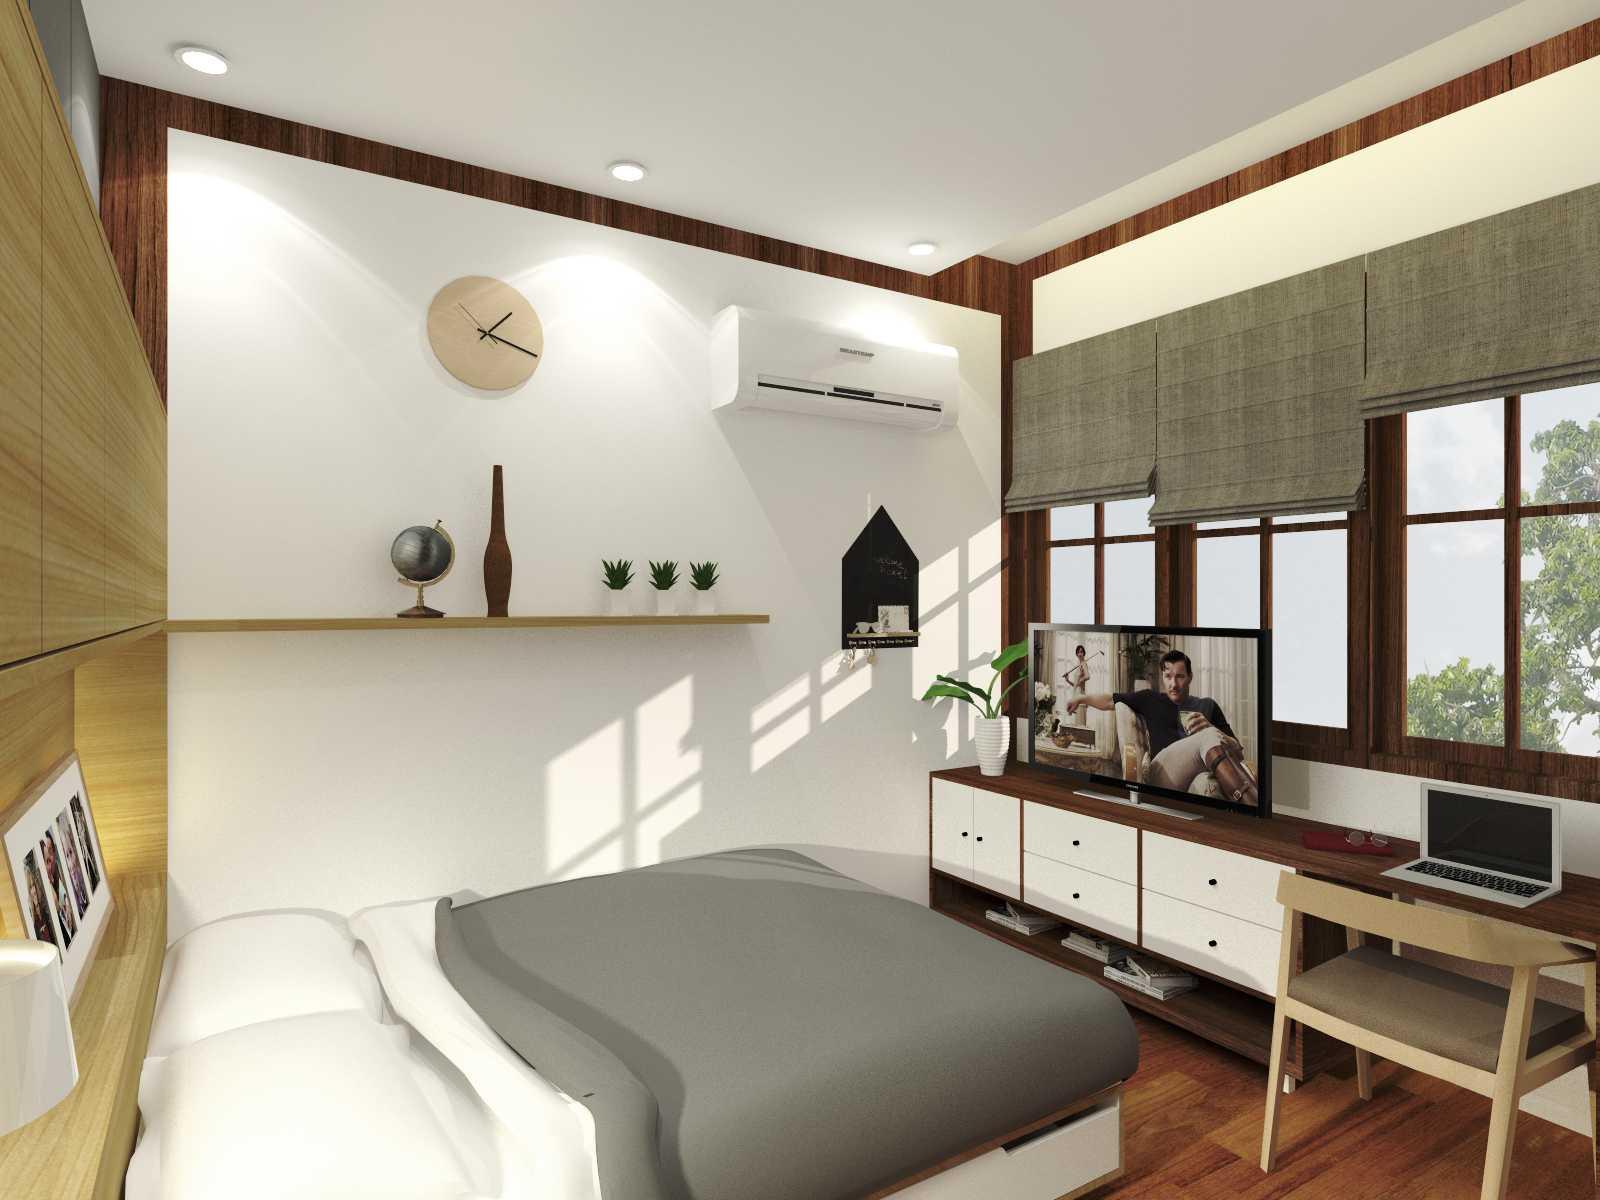 Sekala Interior Rumah Bubutan Surabaya, Kota Sby, Jawa Timur, Indonesia Surabaya, Kota Sby, Jawa Timur, Indonesia Sekala-Interior-Rumah-Bubutan Modern  51462